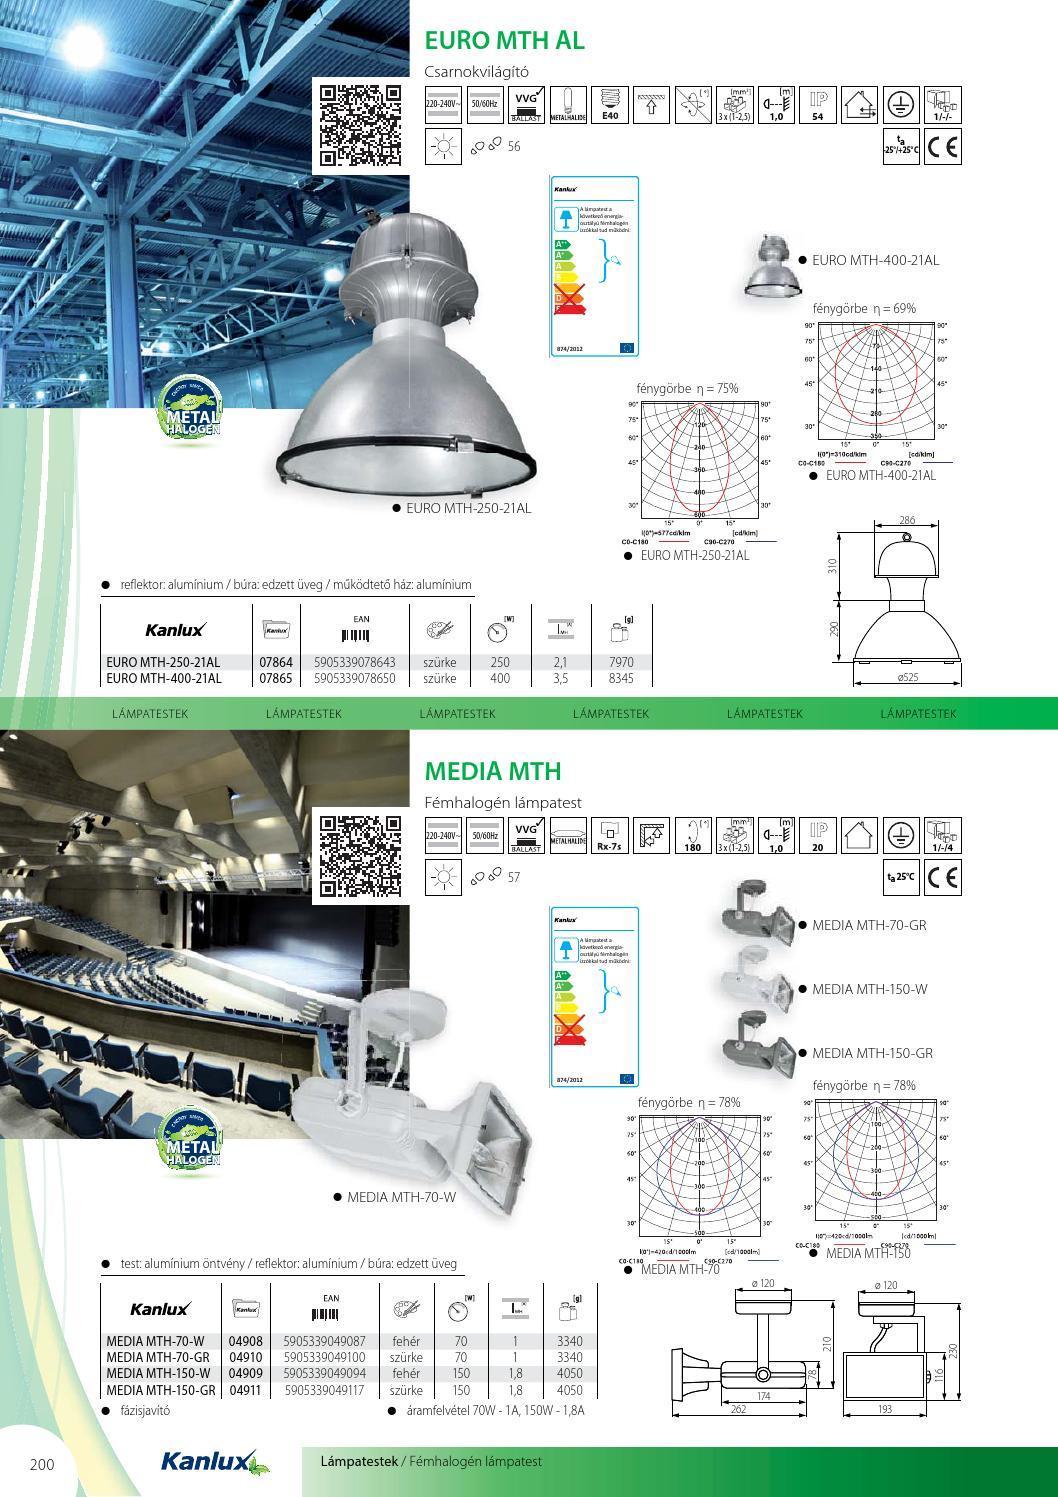 kanlux 2015年led灯设计书籍目录 _礼品设计